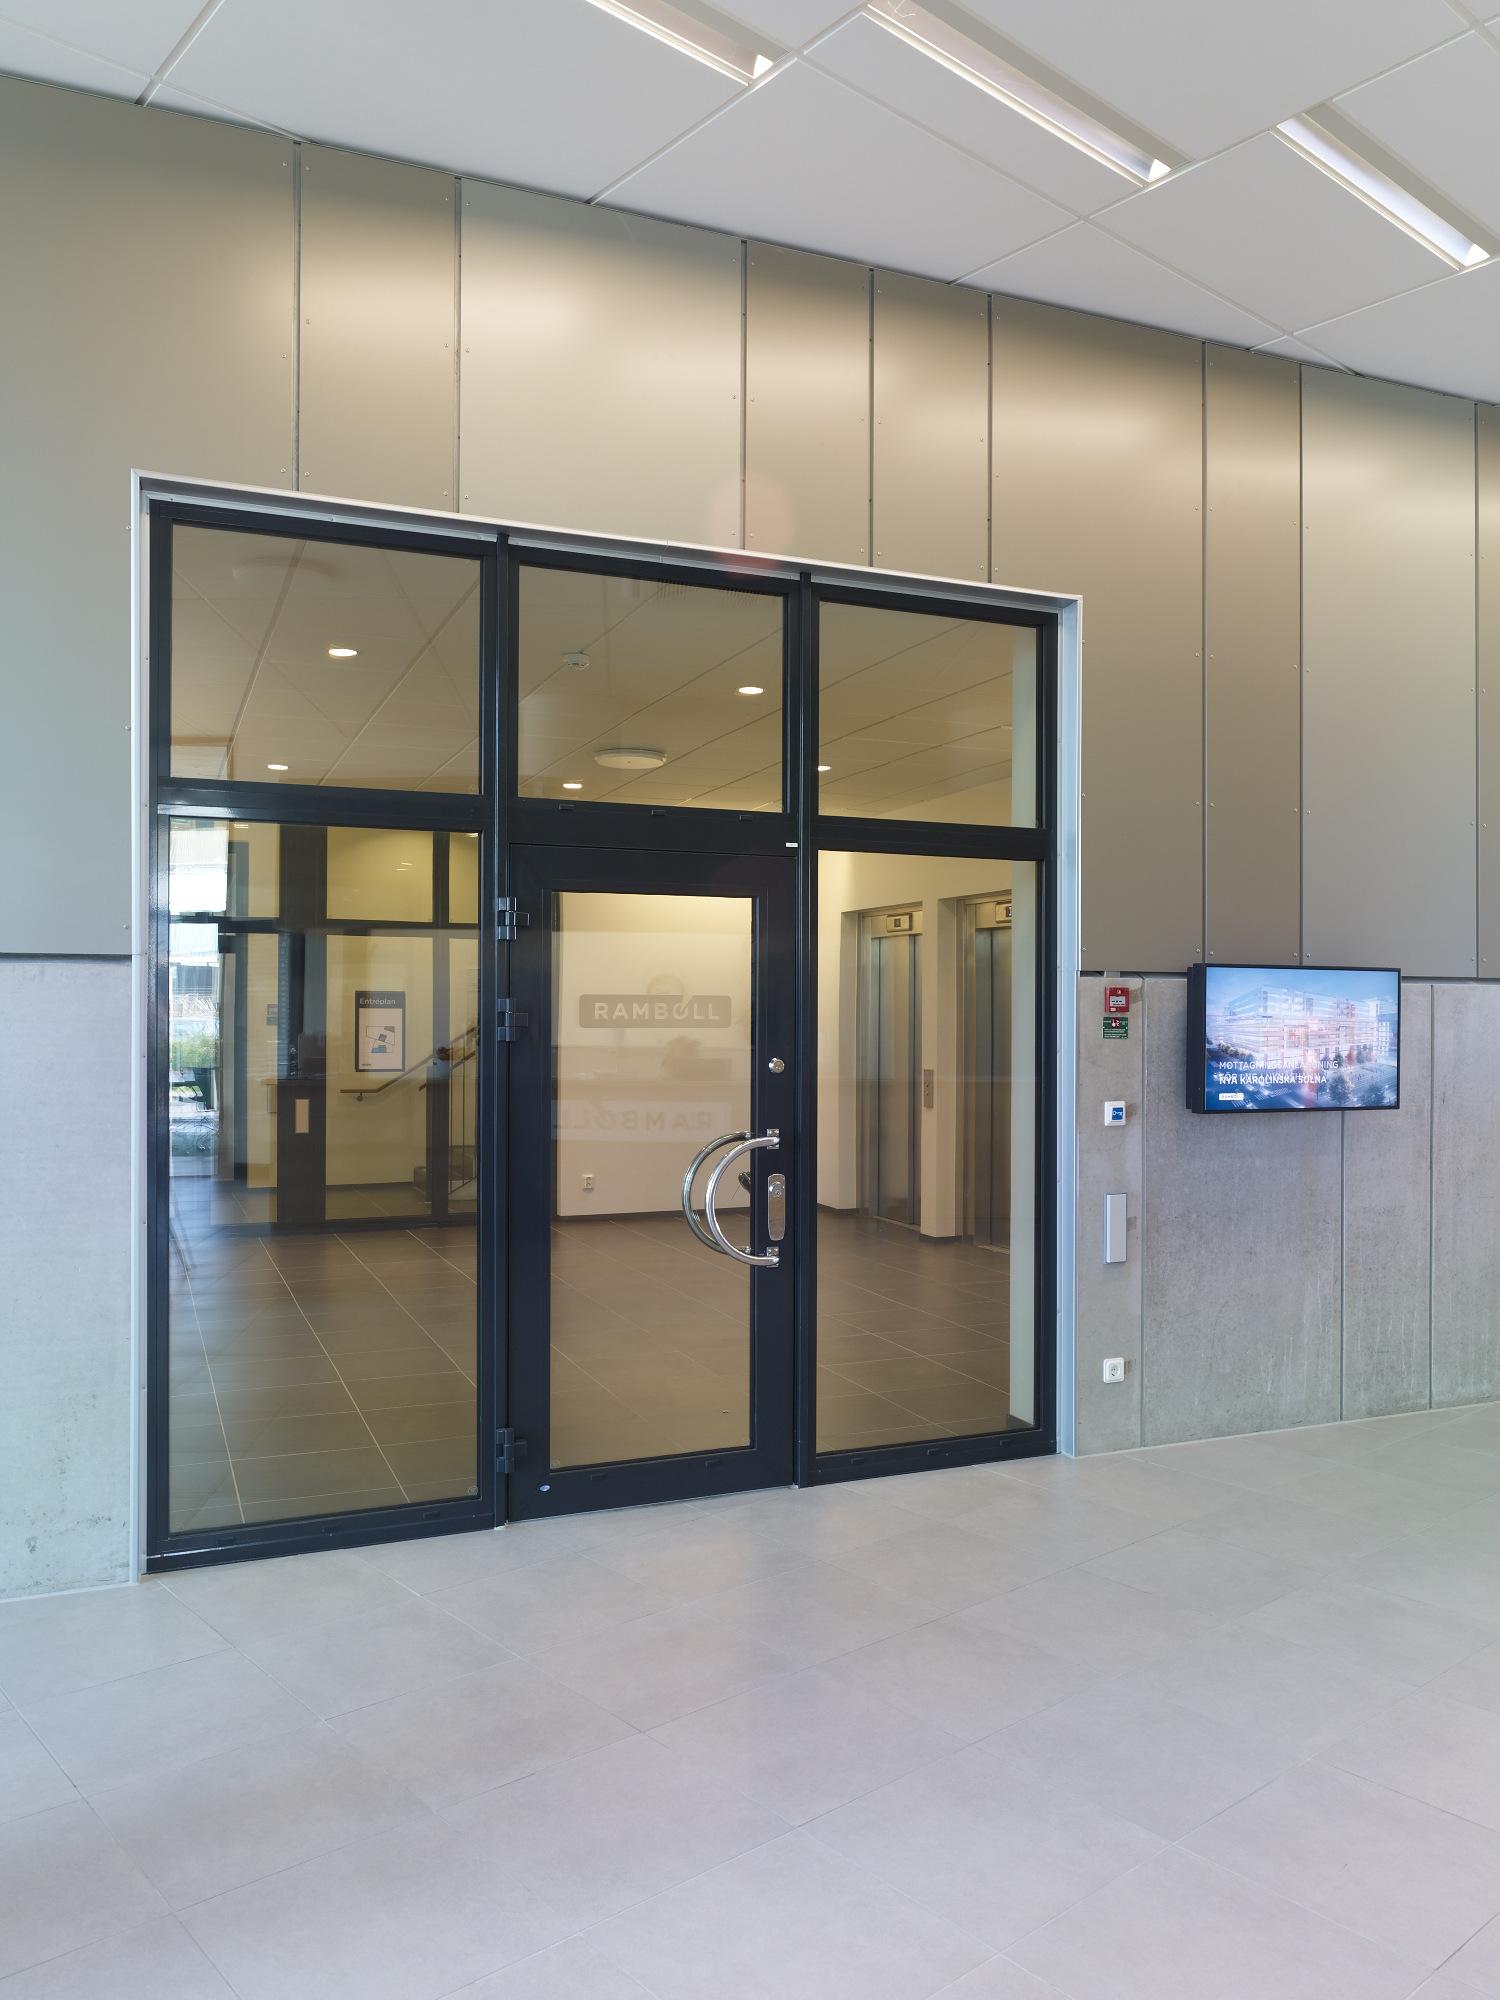 aluminiumdörr, aluminiumdörrar, glasparti, preconal, entré